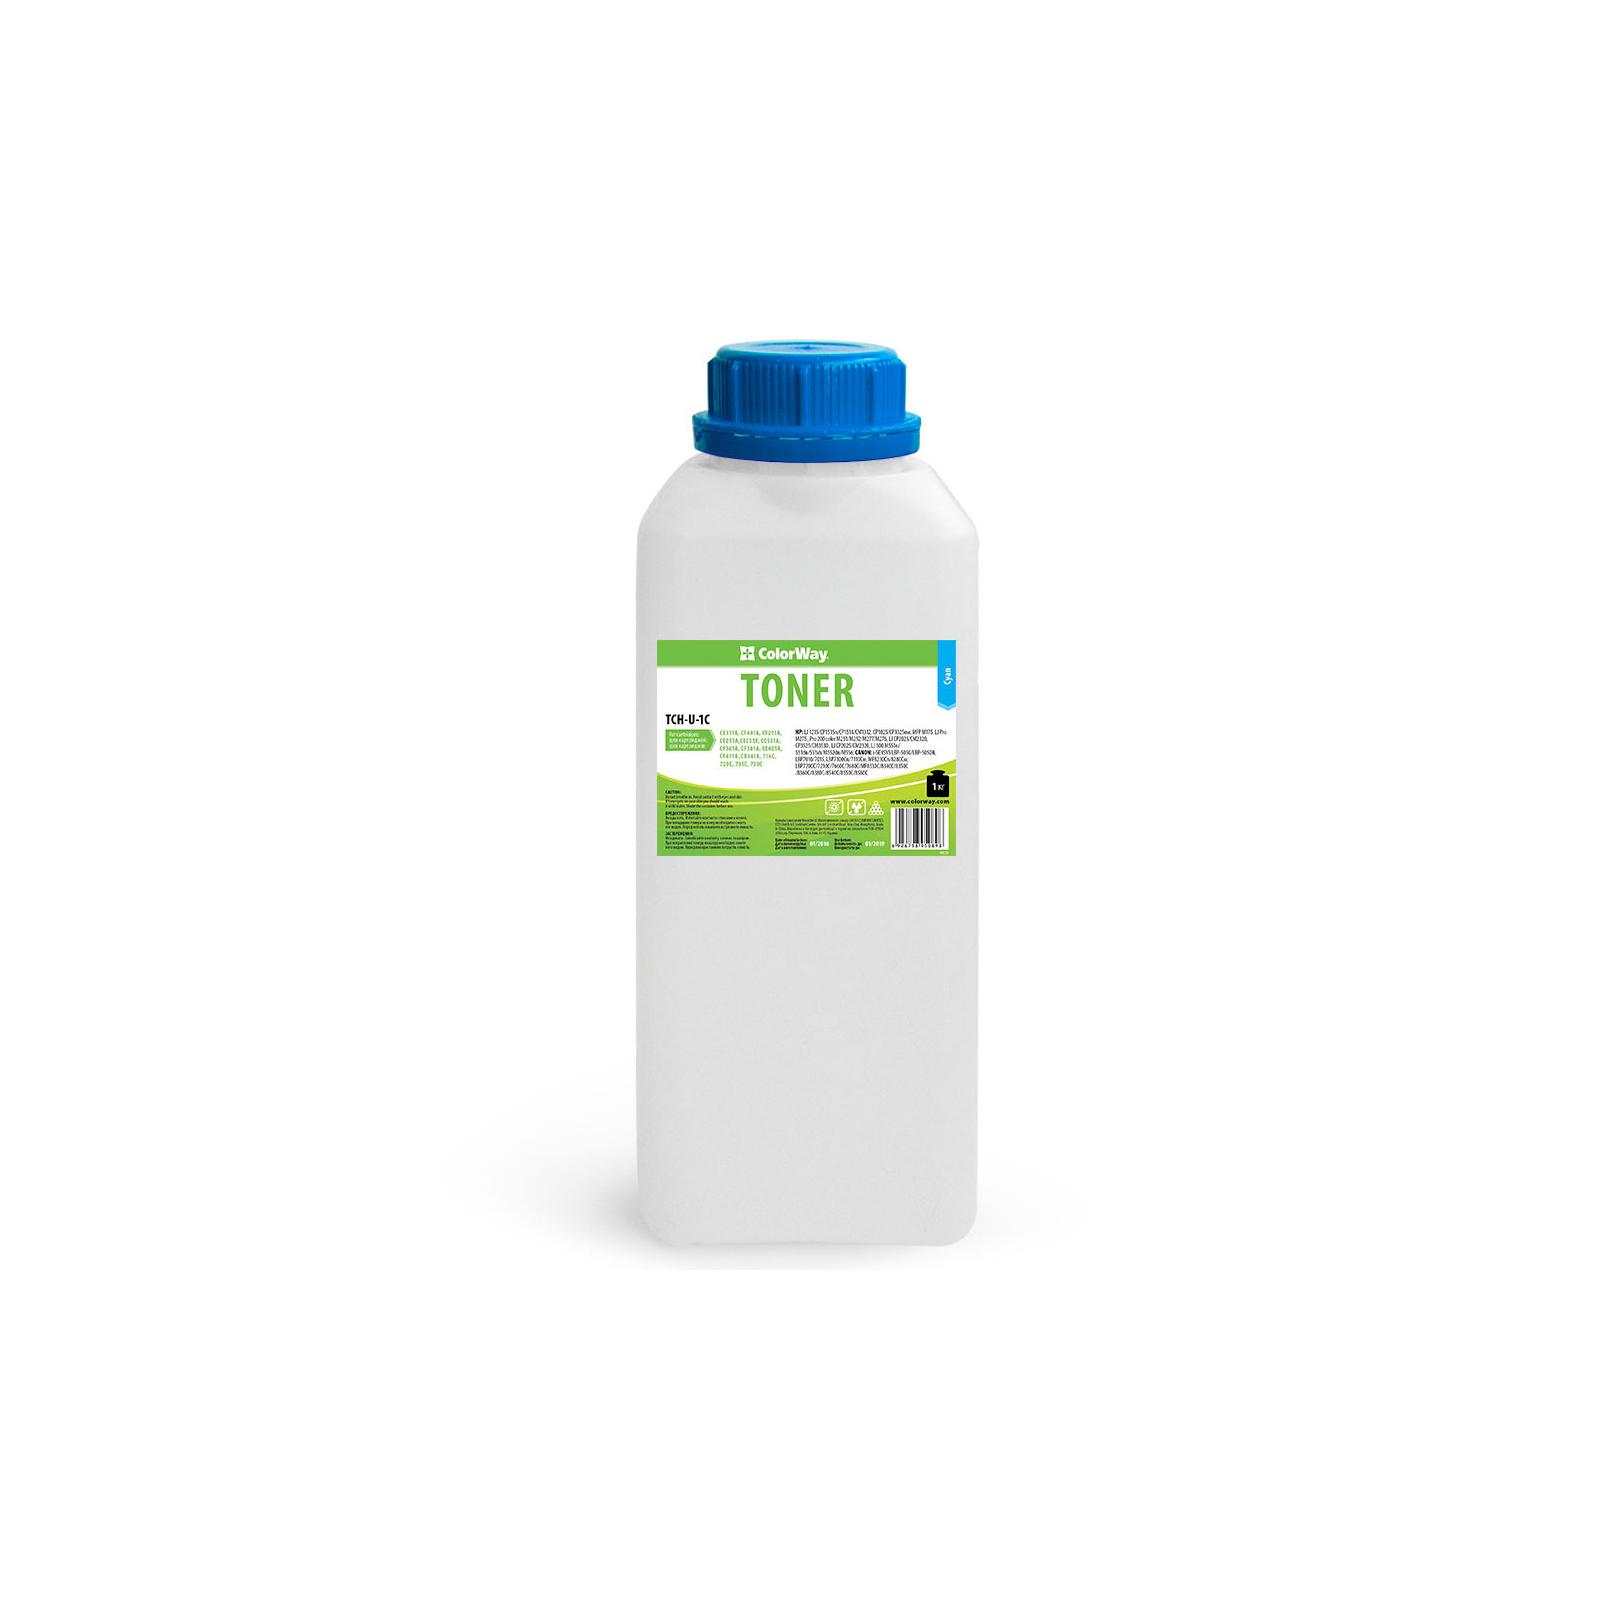 Тонер HP CLJ Universal color Cyan 1kg ColorWay (TCH-U-1C)